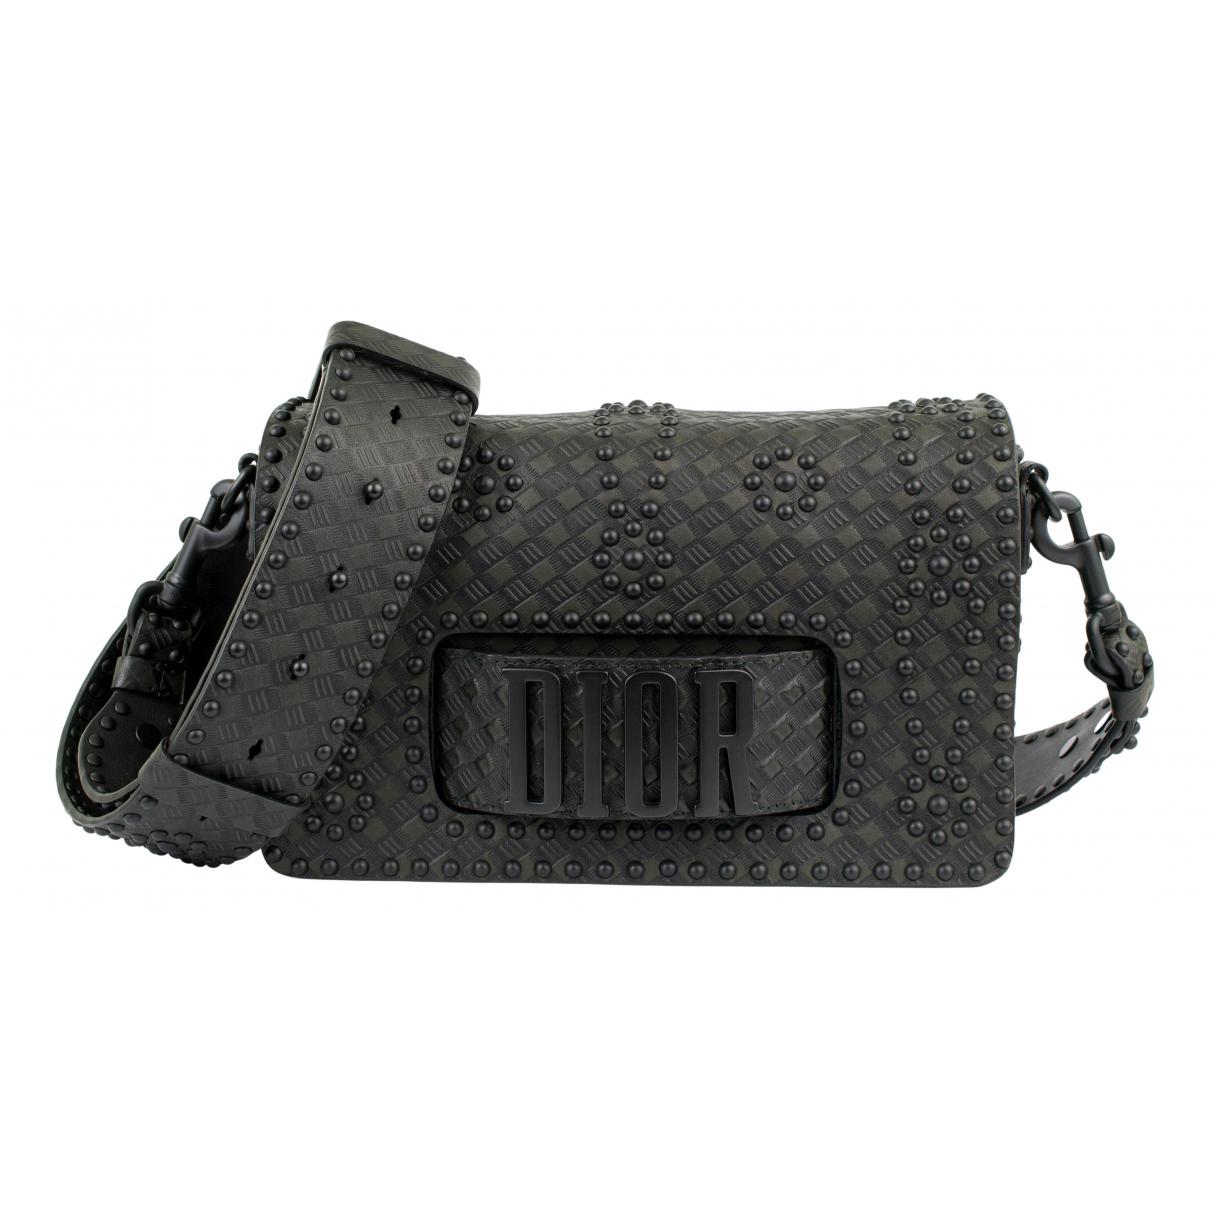 Dior Dio(r)evolution Black Leather handbag for Women N